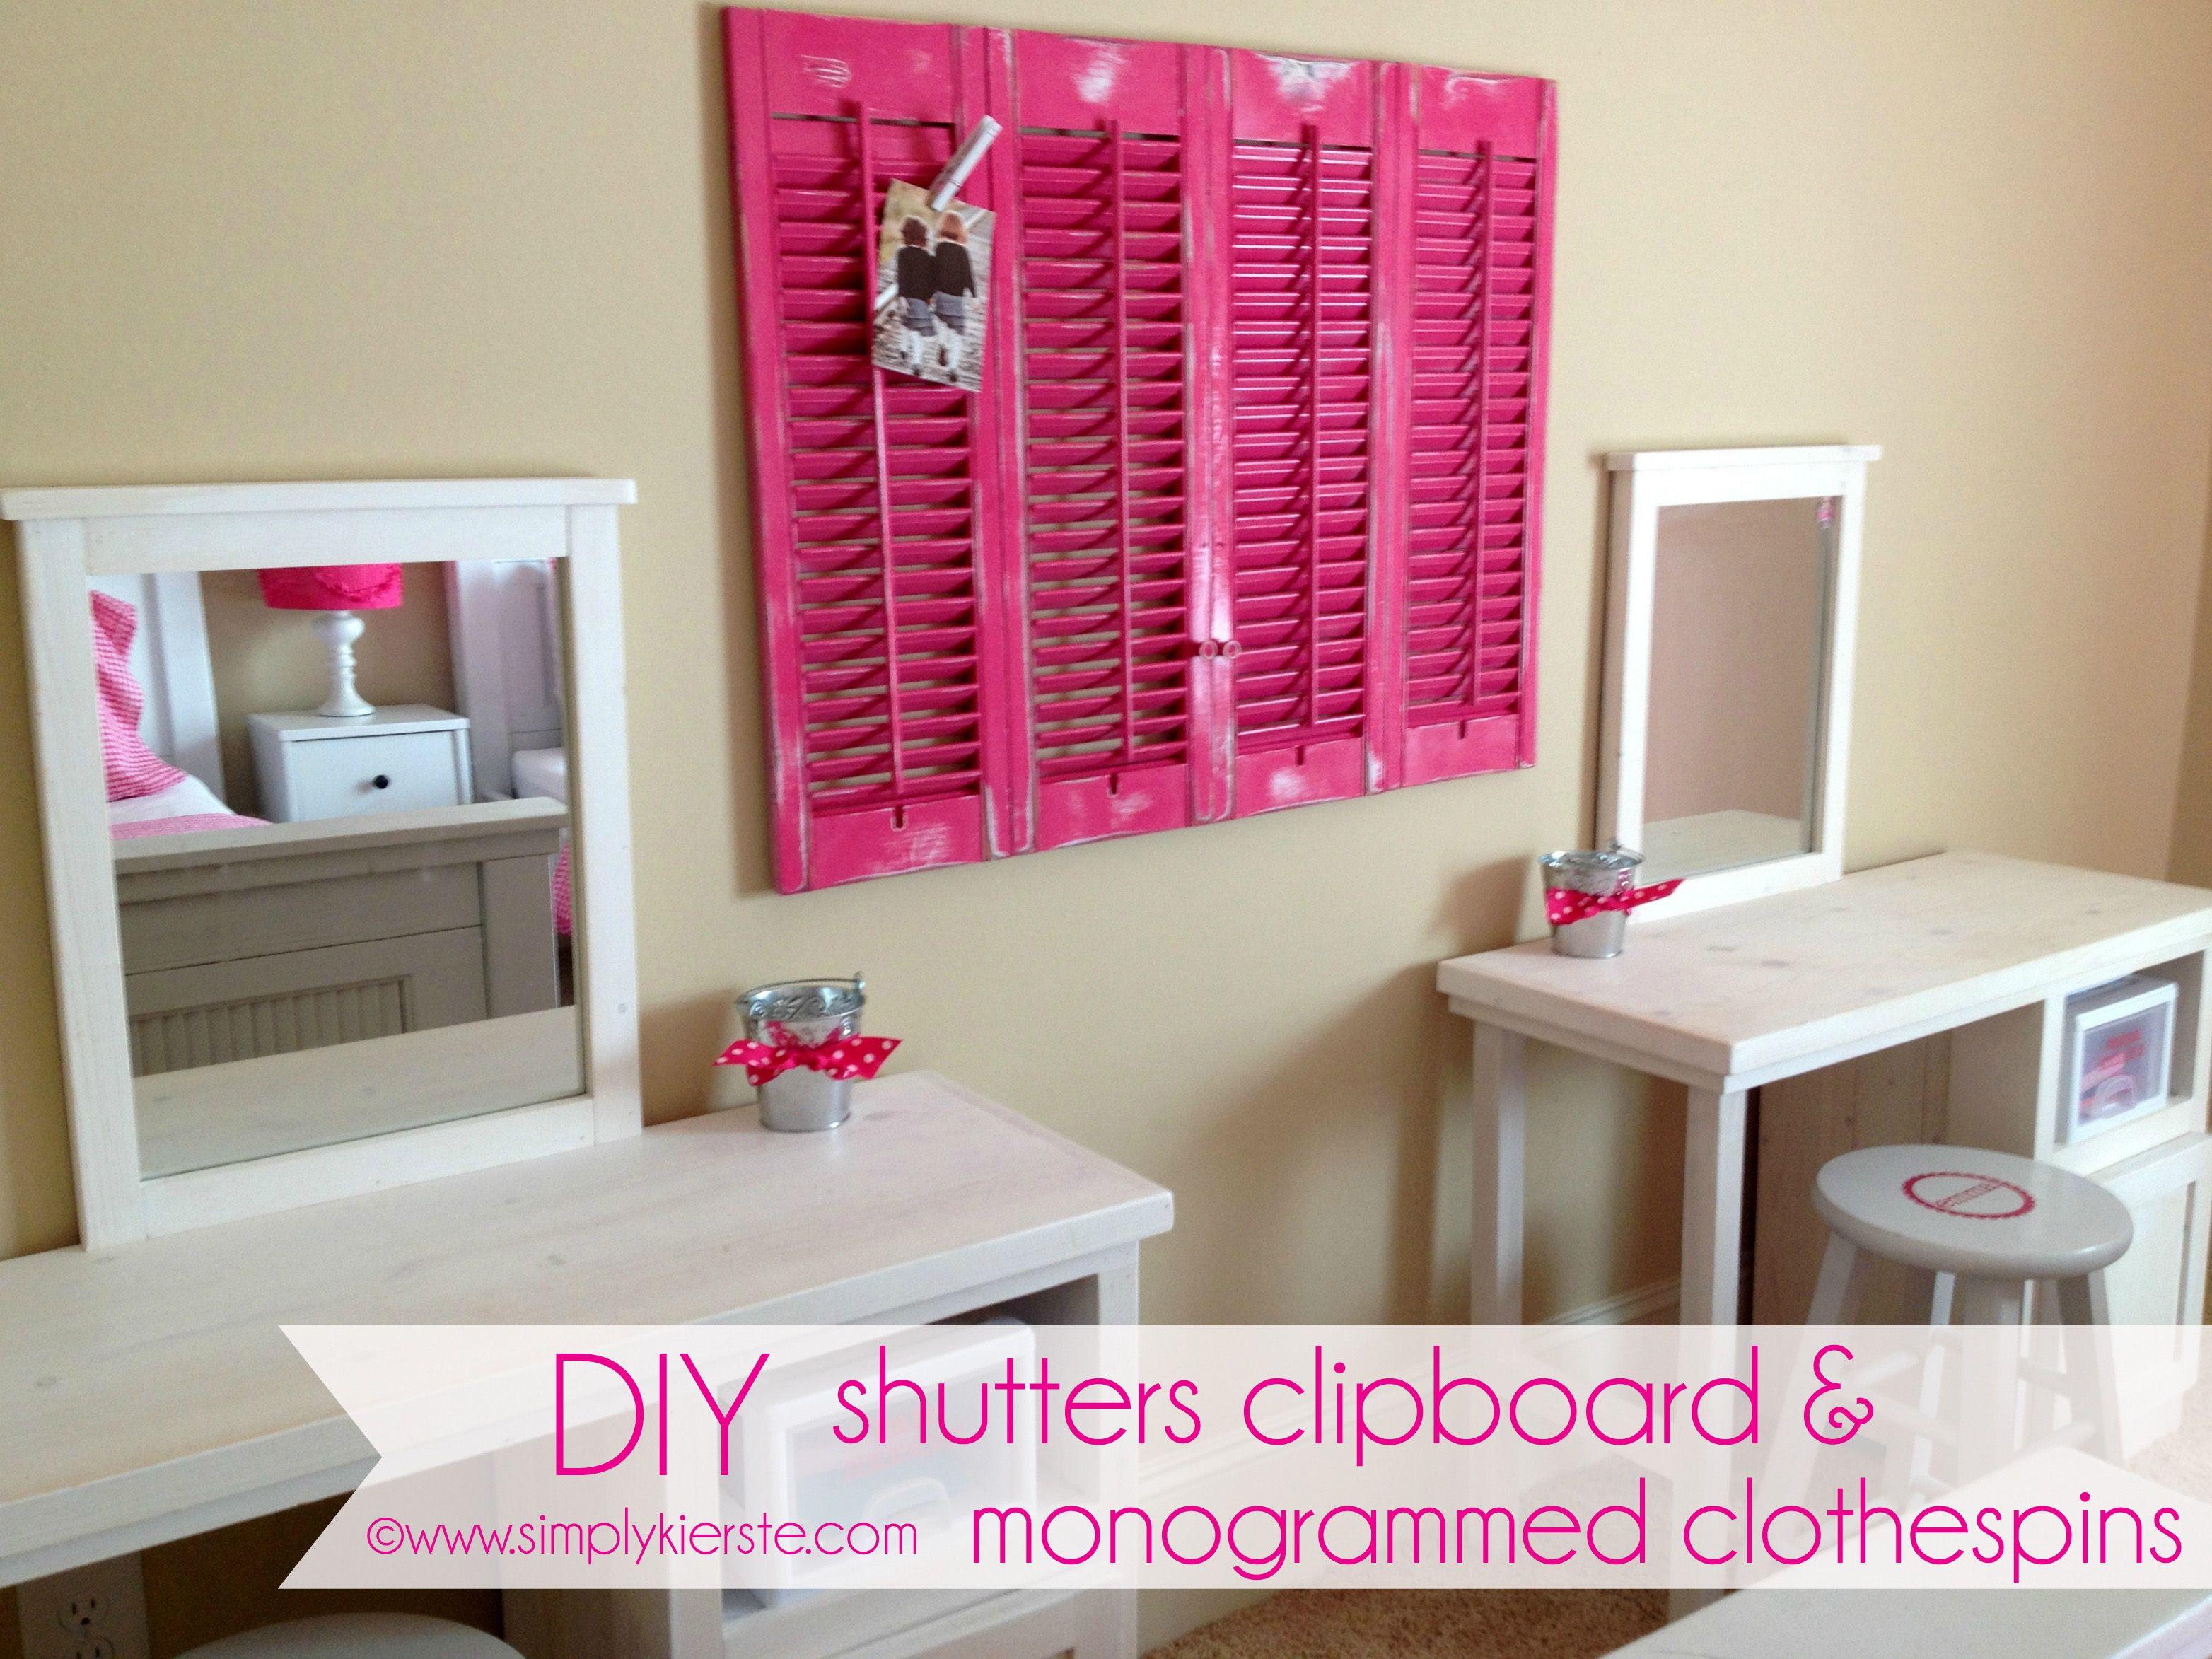 diy room decor for little girls diy shutters clipboard monogrammed clothespins this - Diy Bedroom Decor Ideas